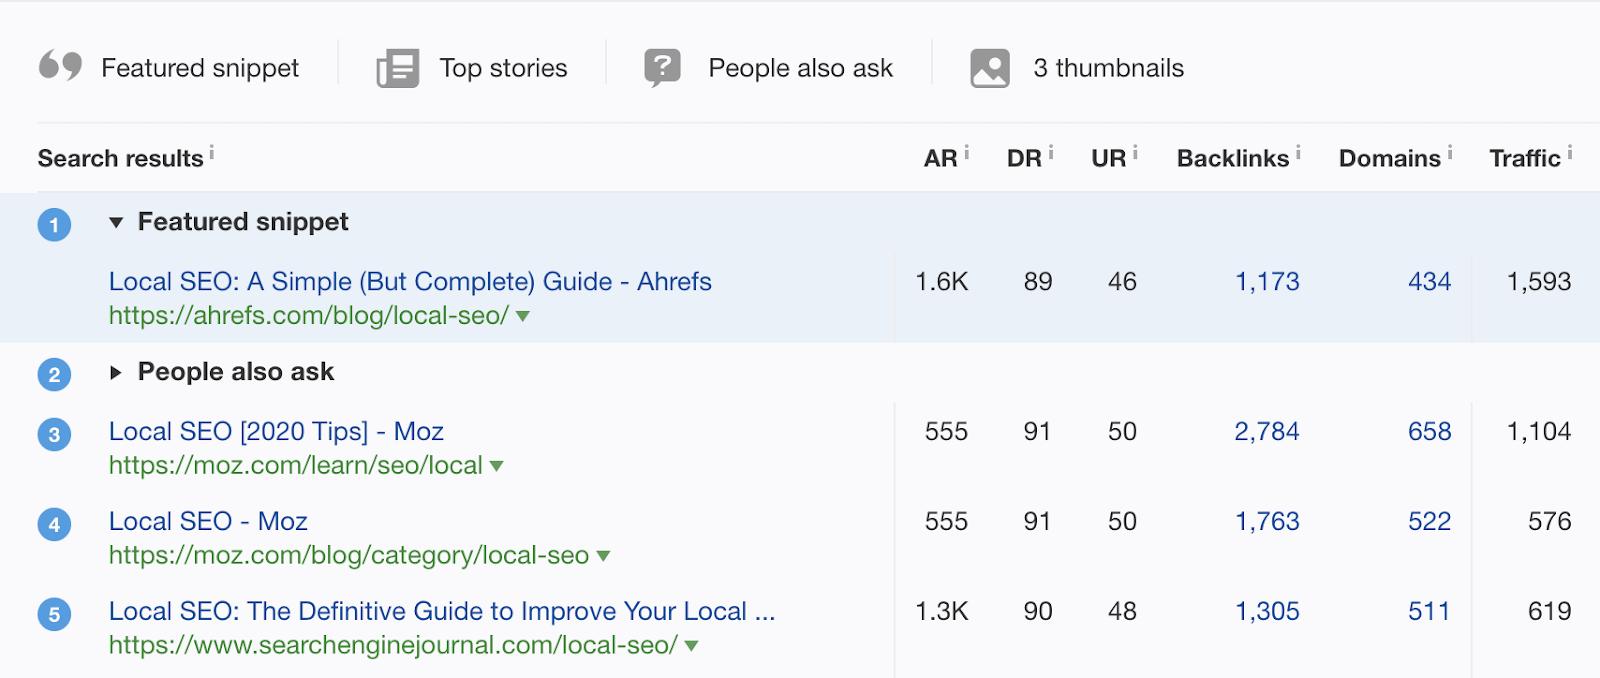 8 local seo ranking